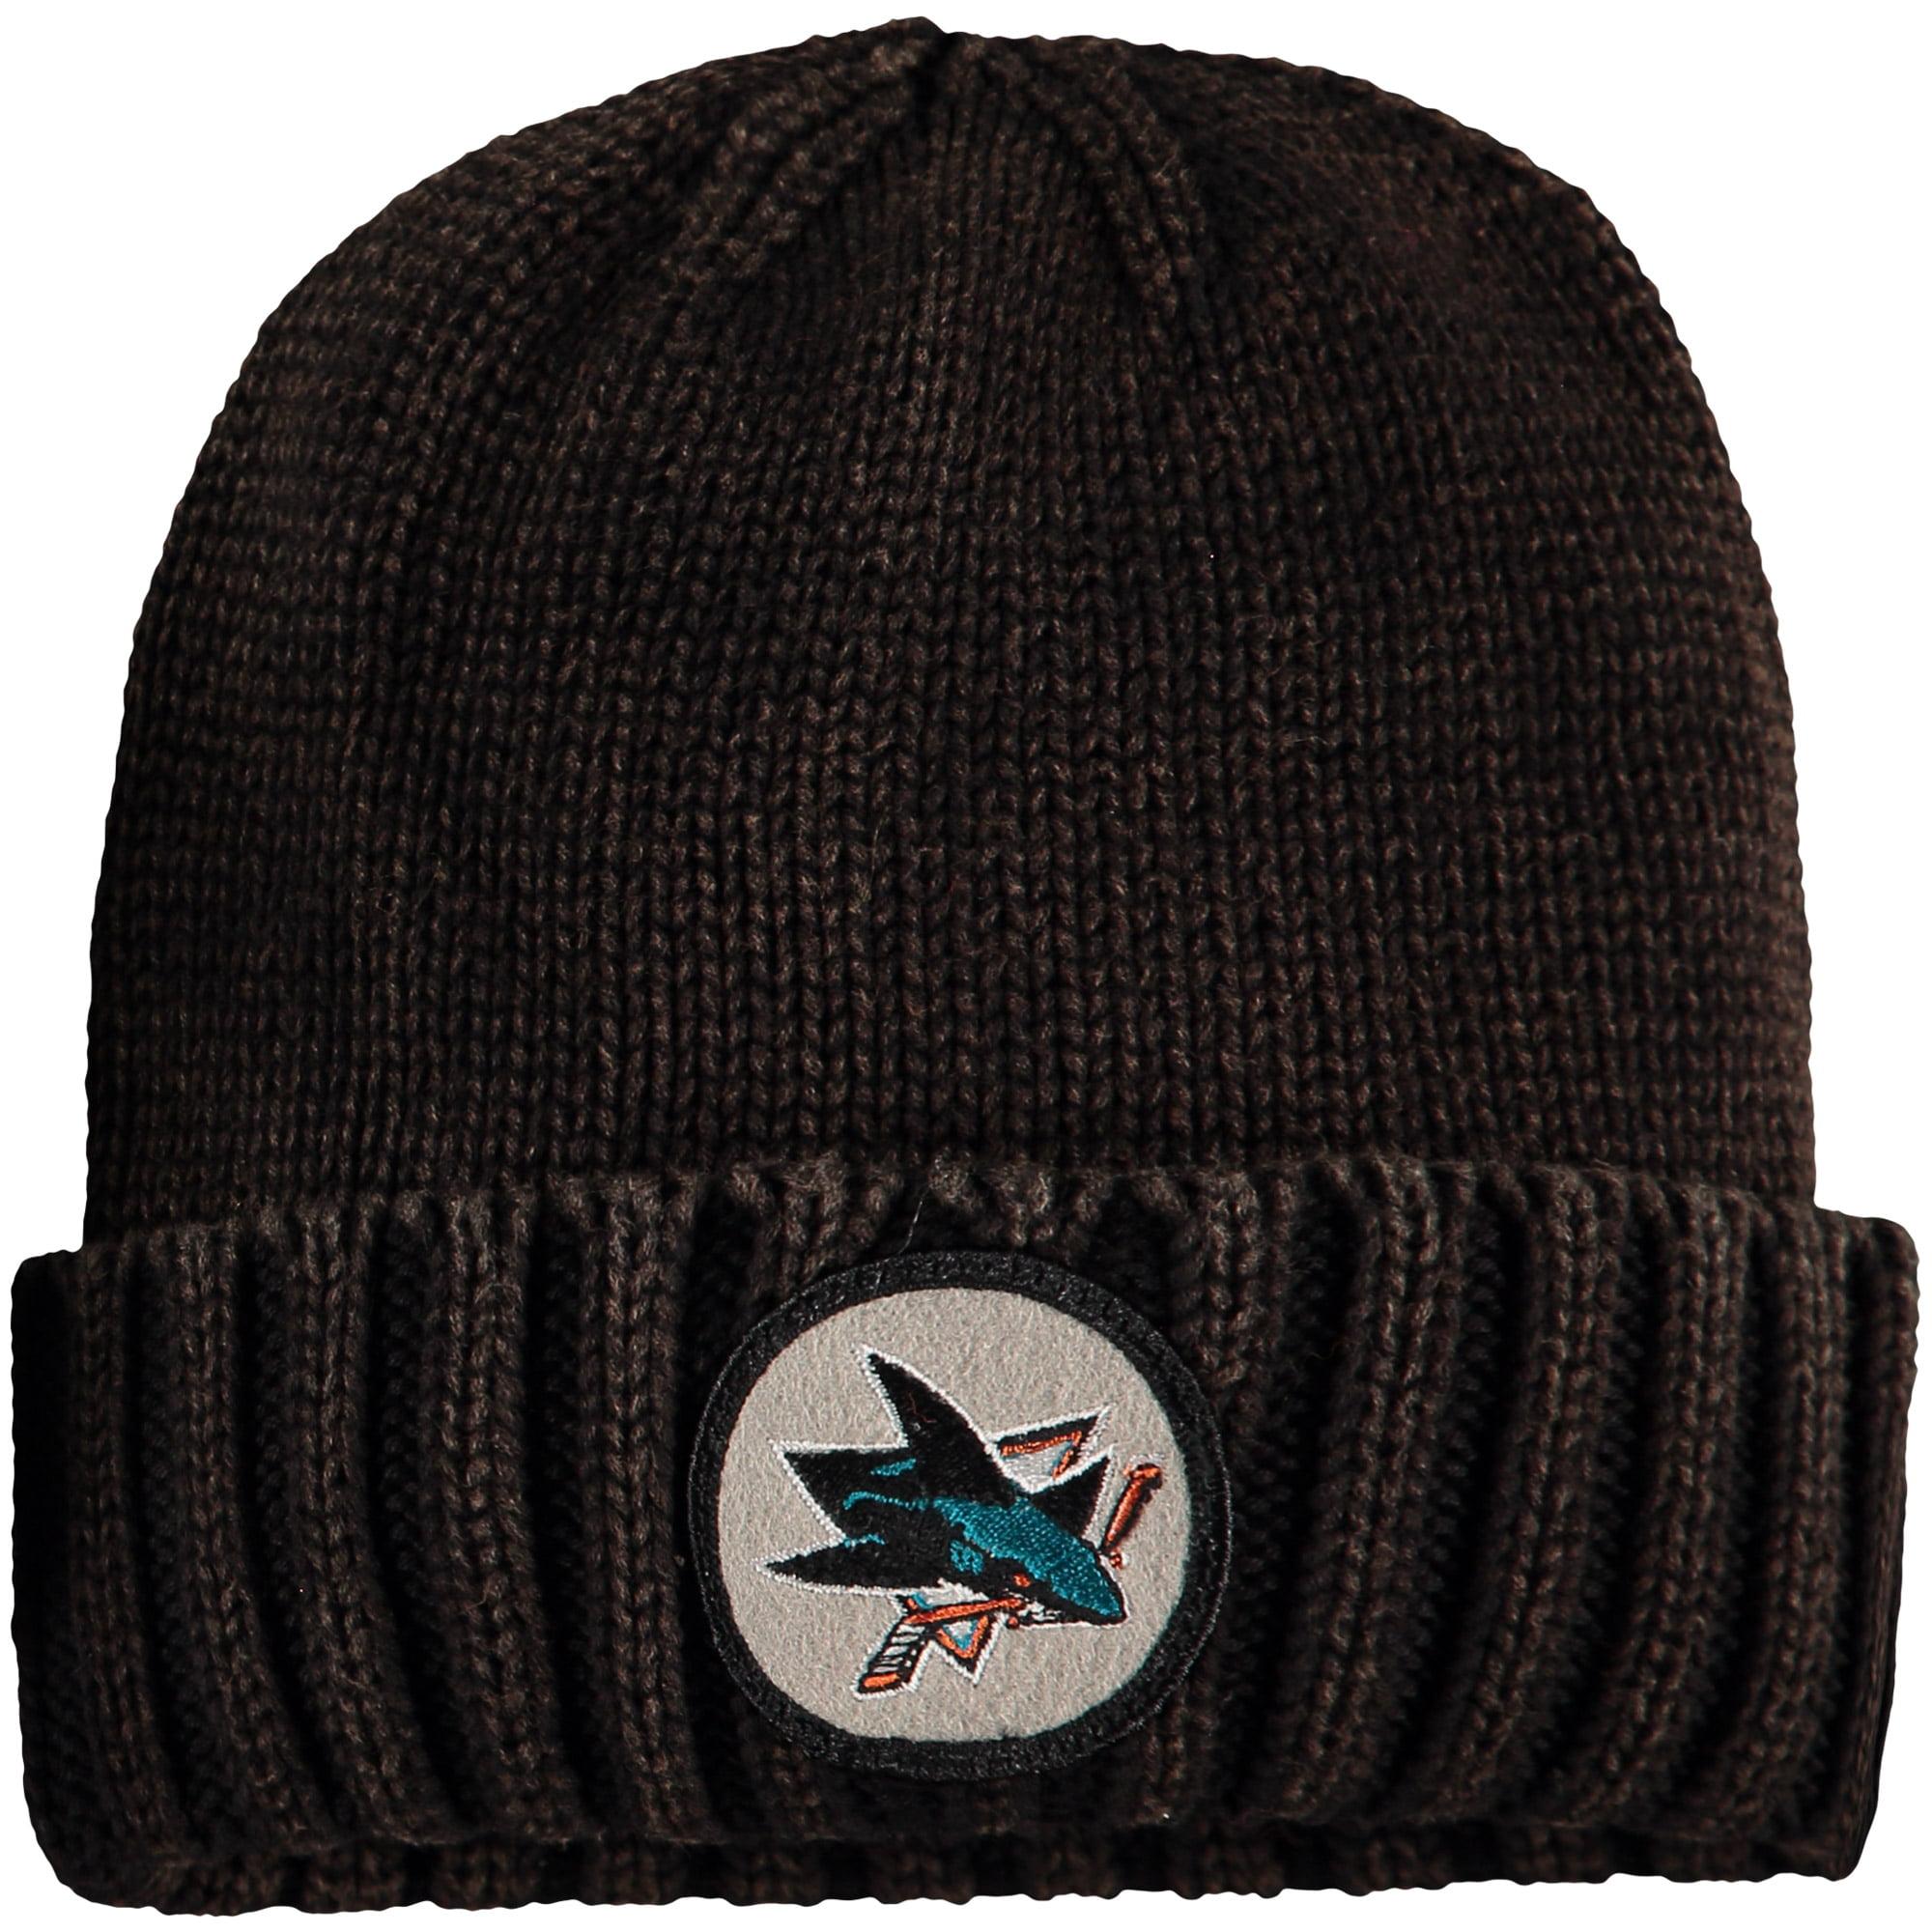 San Jose Sharks Mitchell & Ness Current Logo Ribbed Cuffed Knit Hat - Brown - OSFA